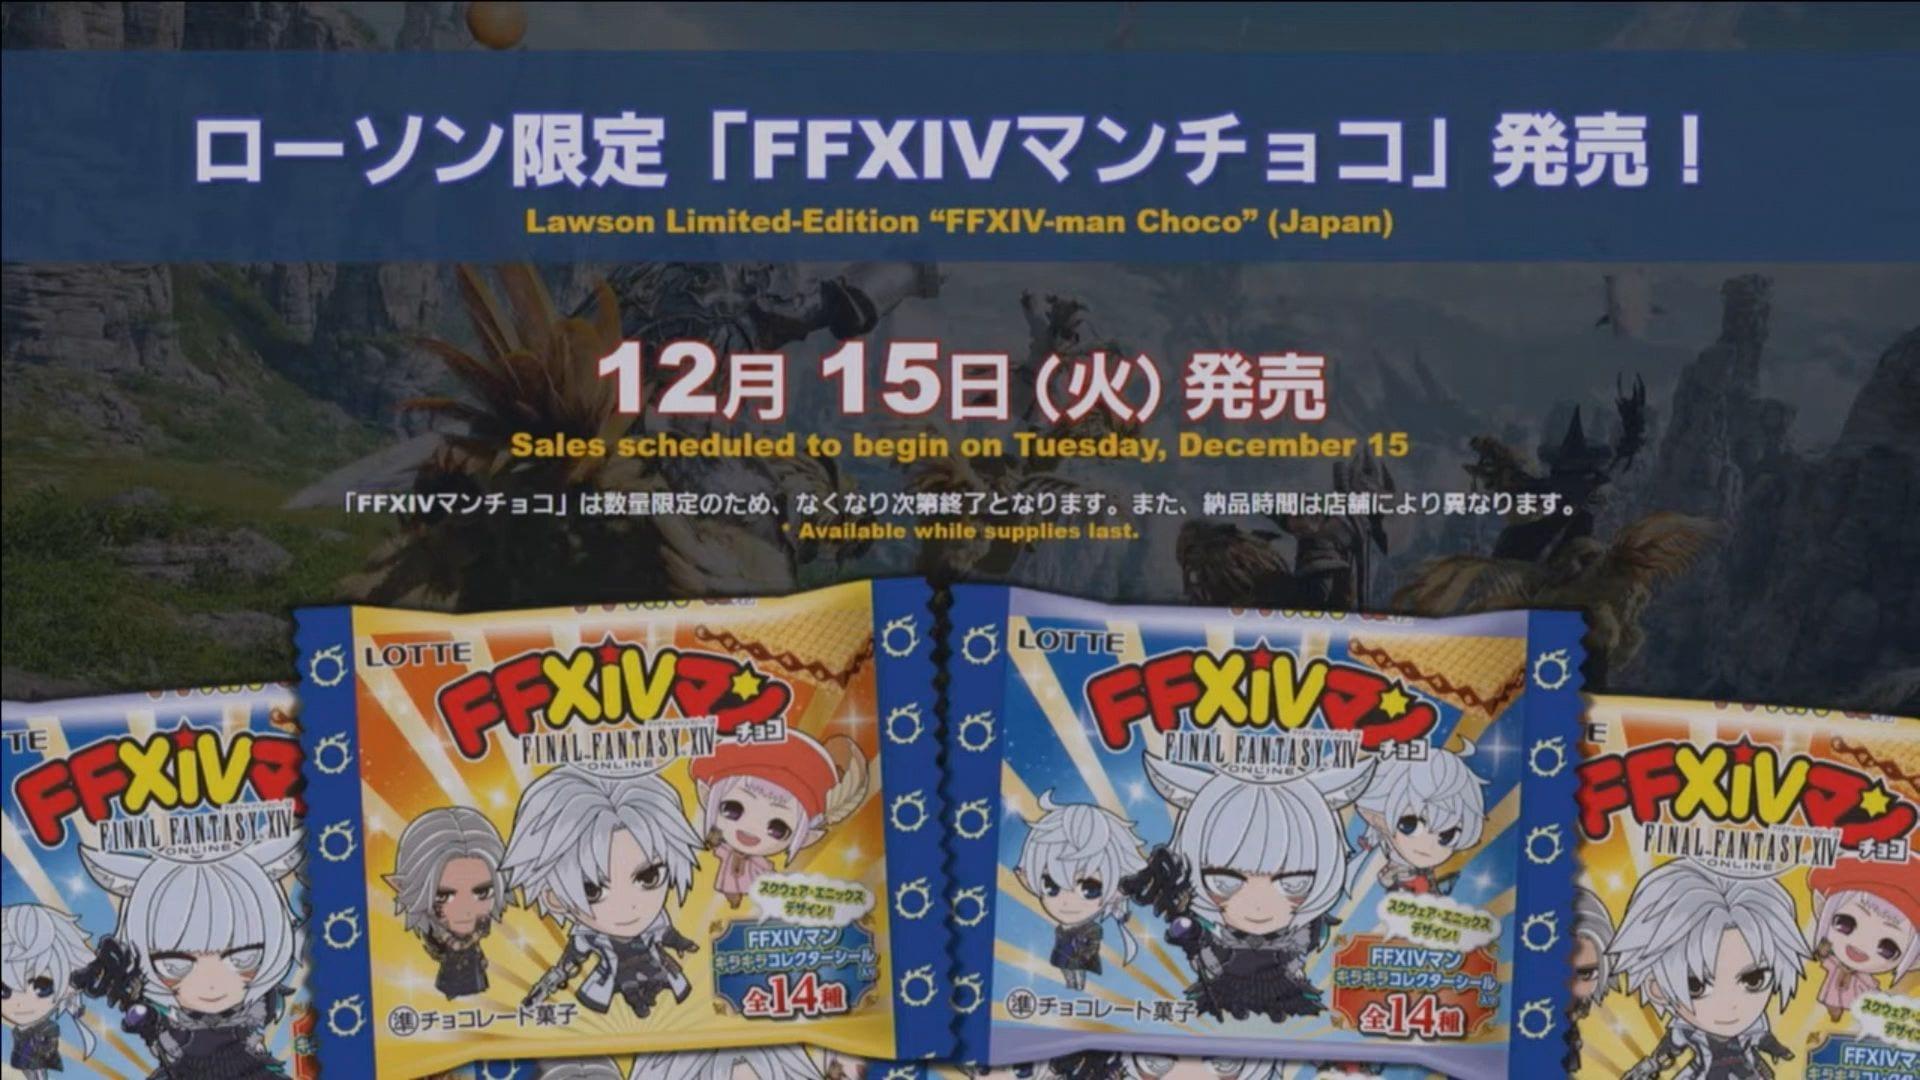 Final-Fantasy-XIV-Screenshot-2020-11-27-15-12-16.jpg?ssl=1